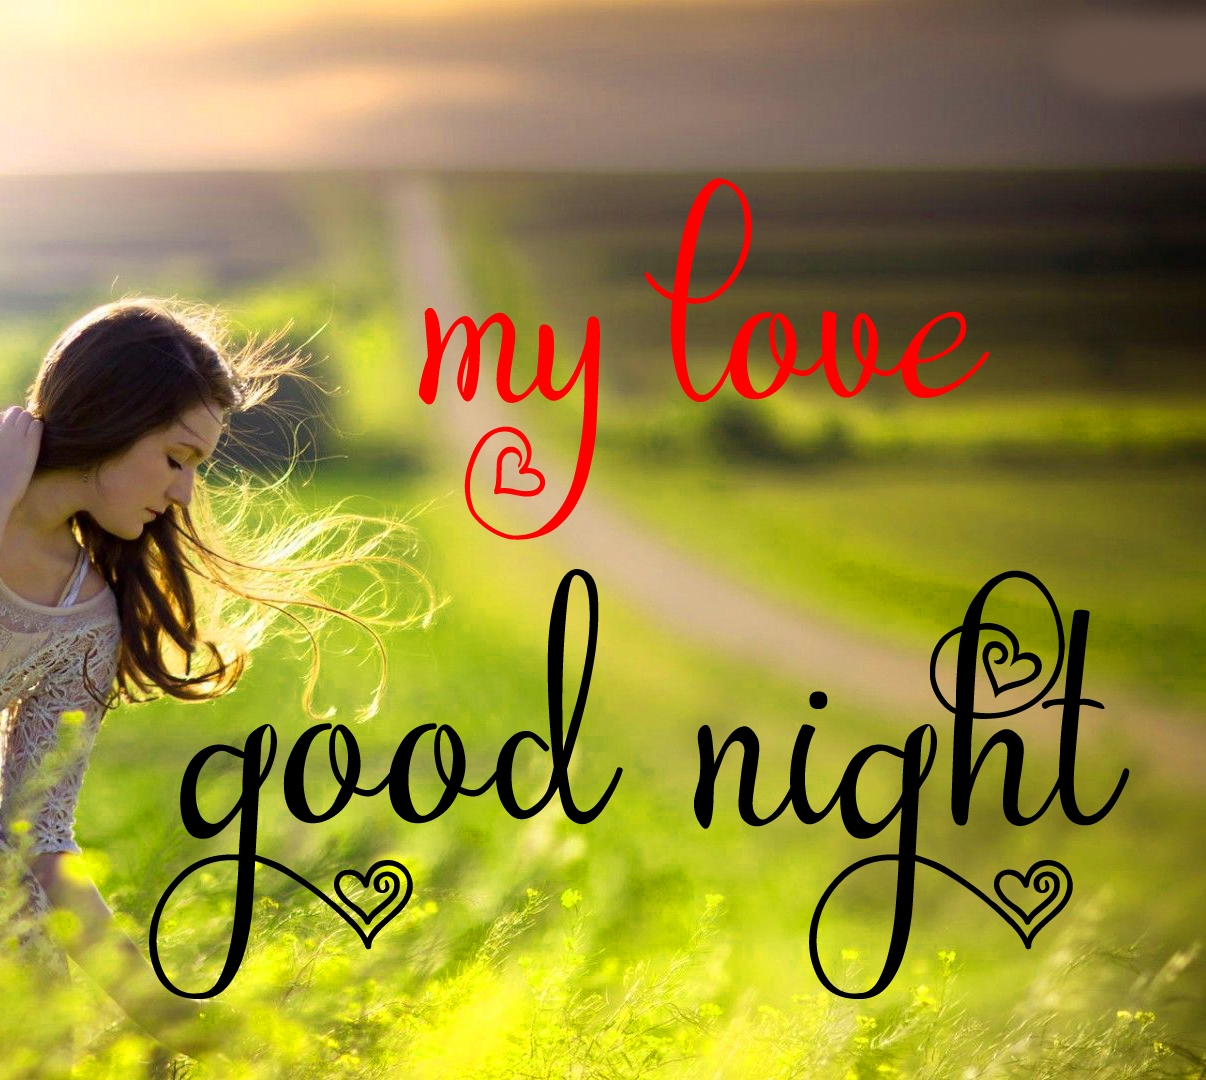 Free good night Images 49